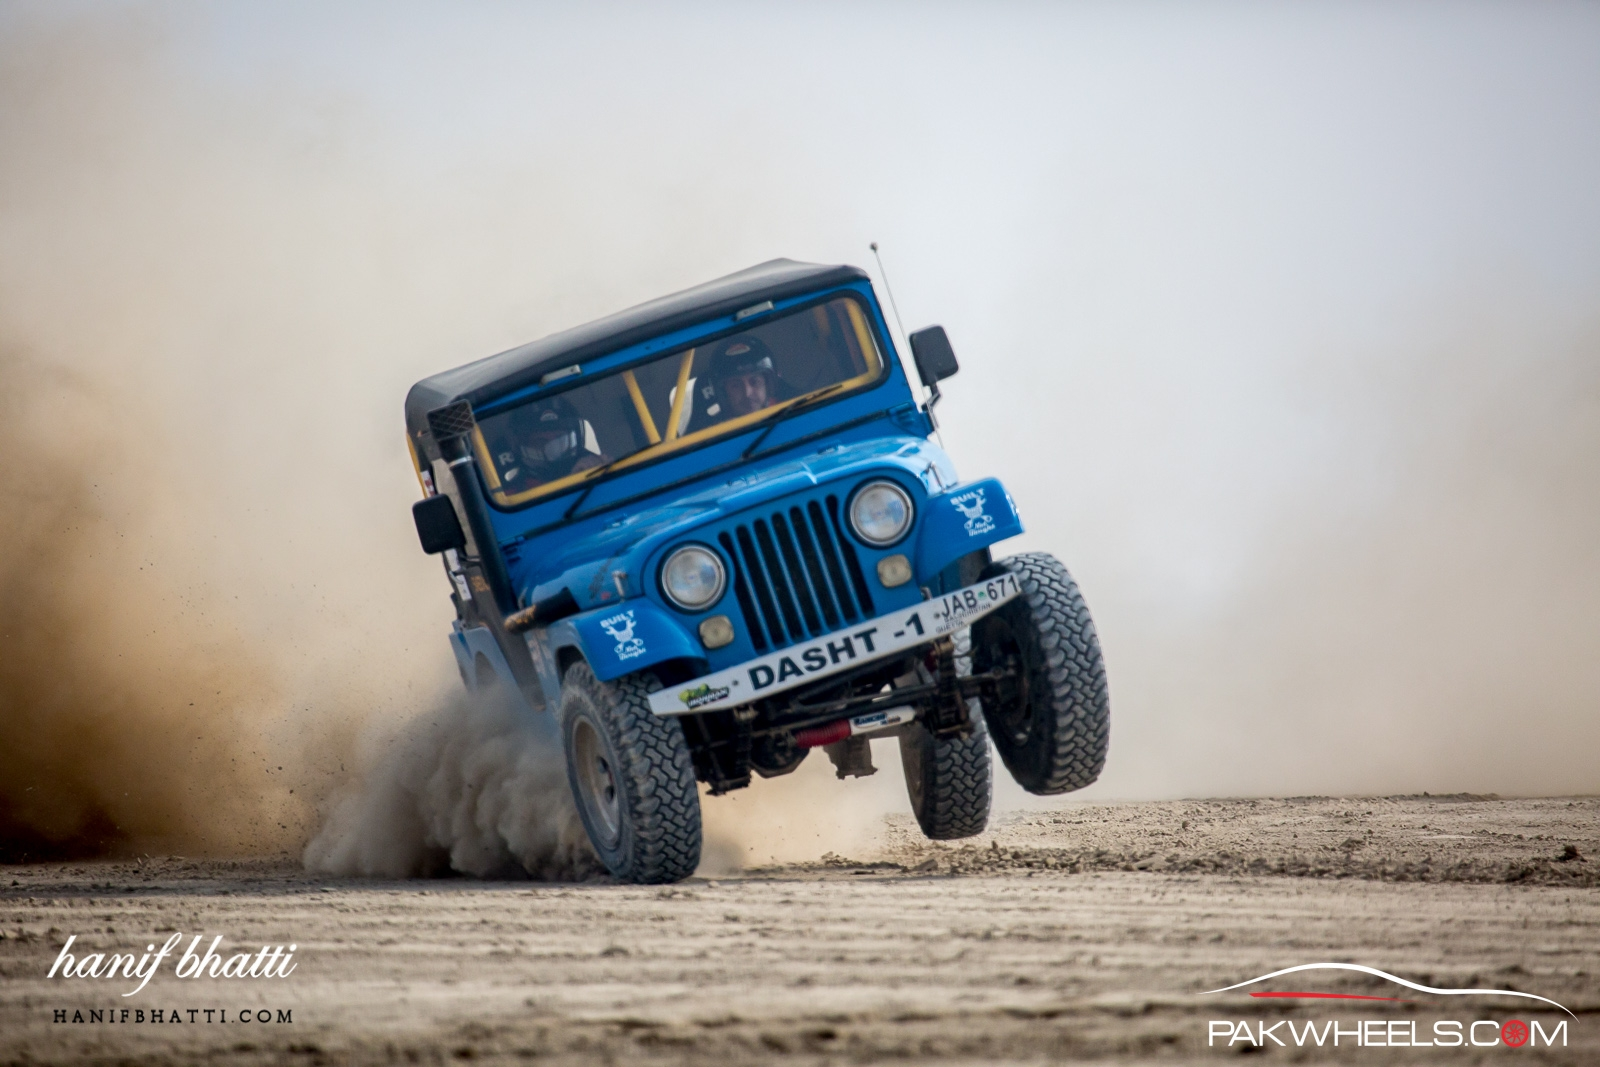 Jhal_Magsi_Desert_Challenge_Race_Dec_2014_5D 145